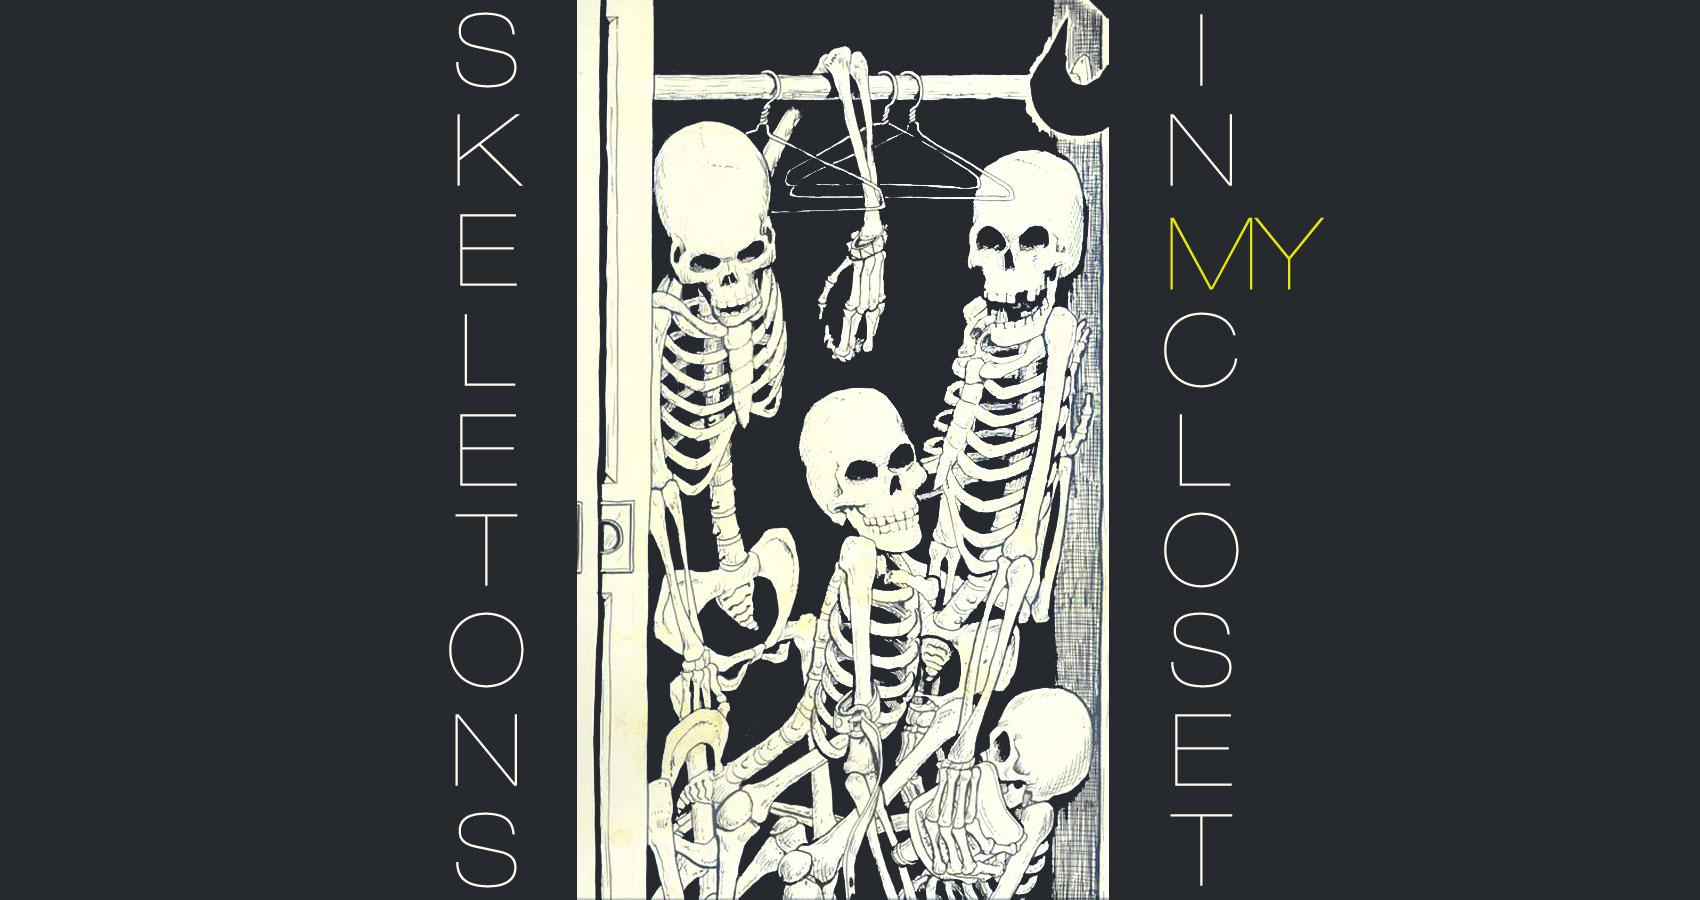 Skeletons In My Closet written by Fallen Engel at Spillwords.com